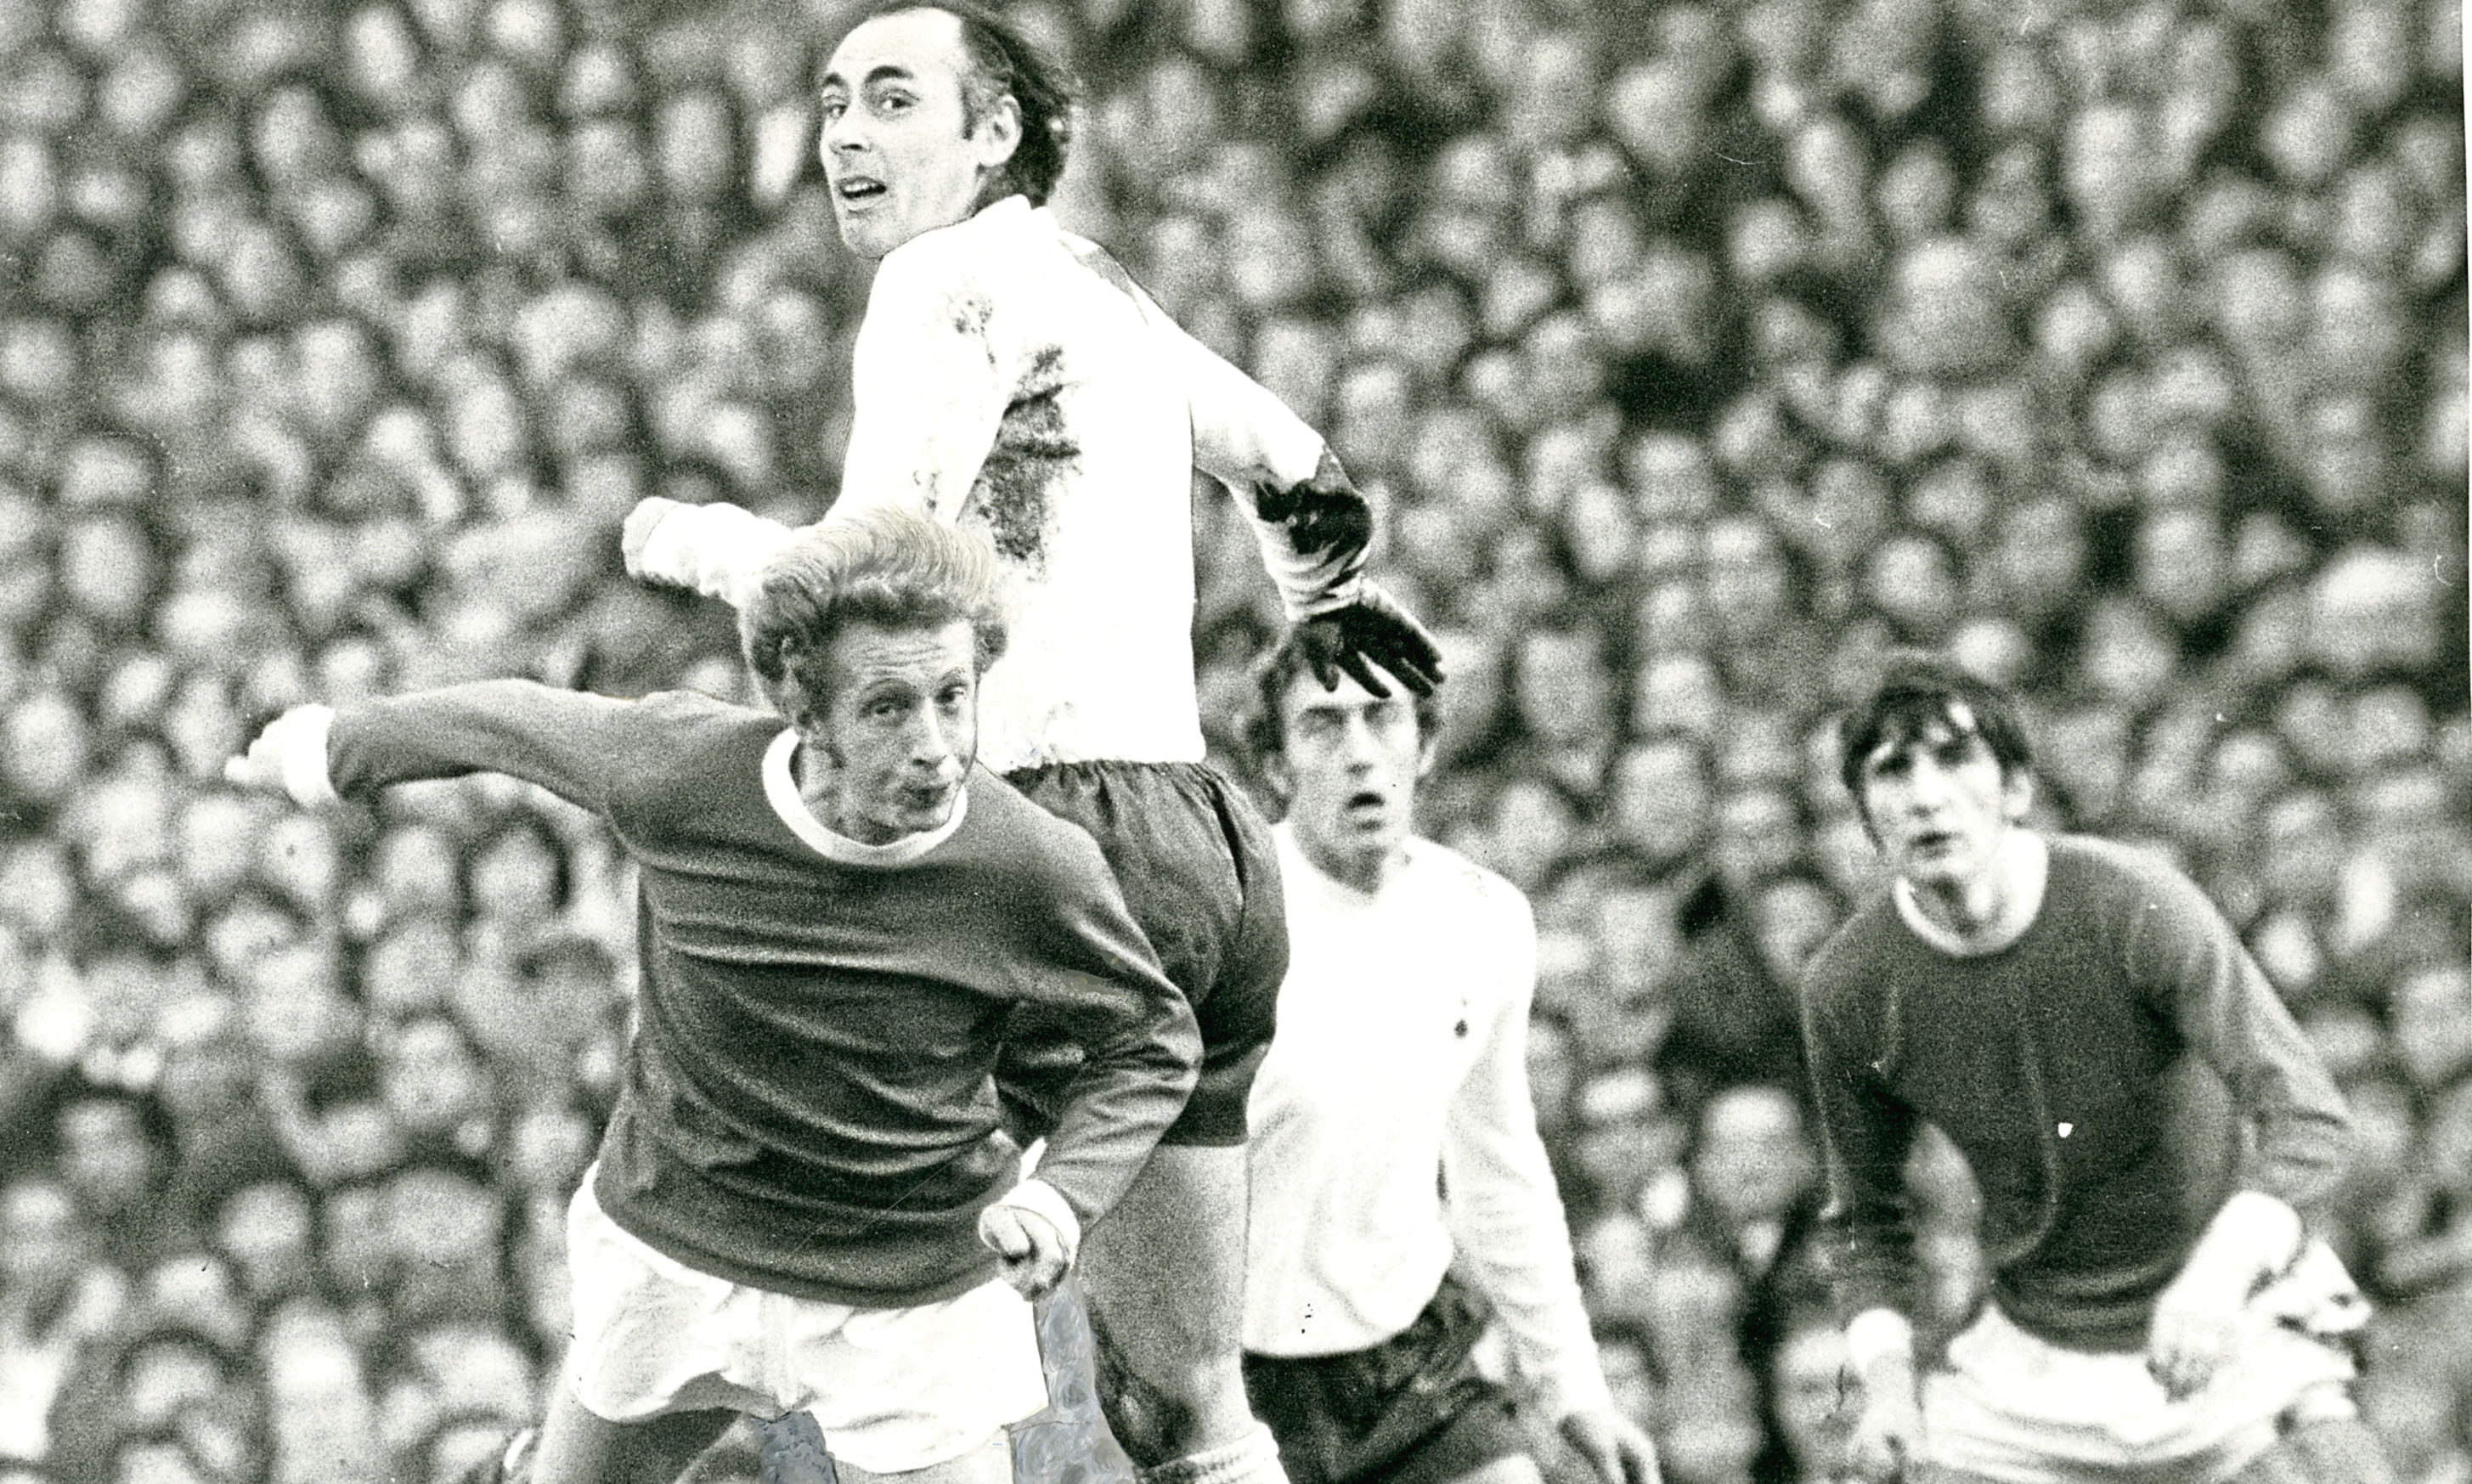 Spusr v Manchester United: Alan gets above another Scottish legend Denis Law when Manchester United played at White Hart Lane in 1971.